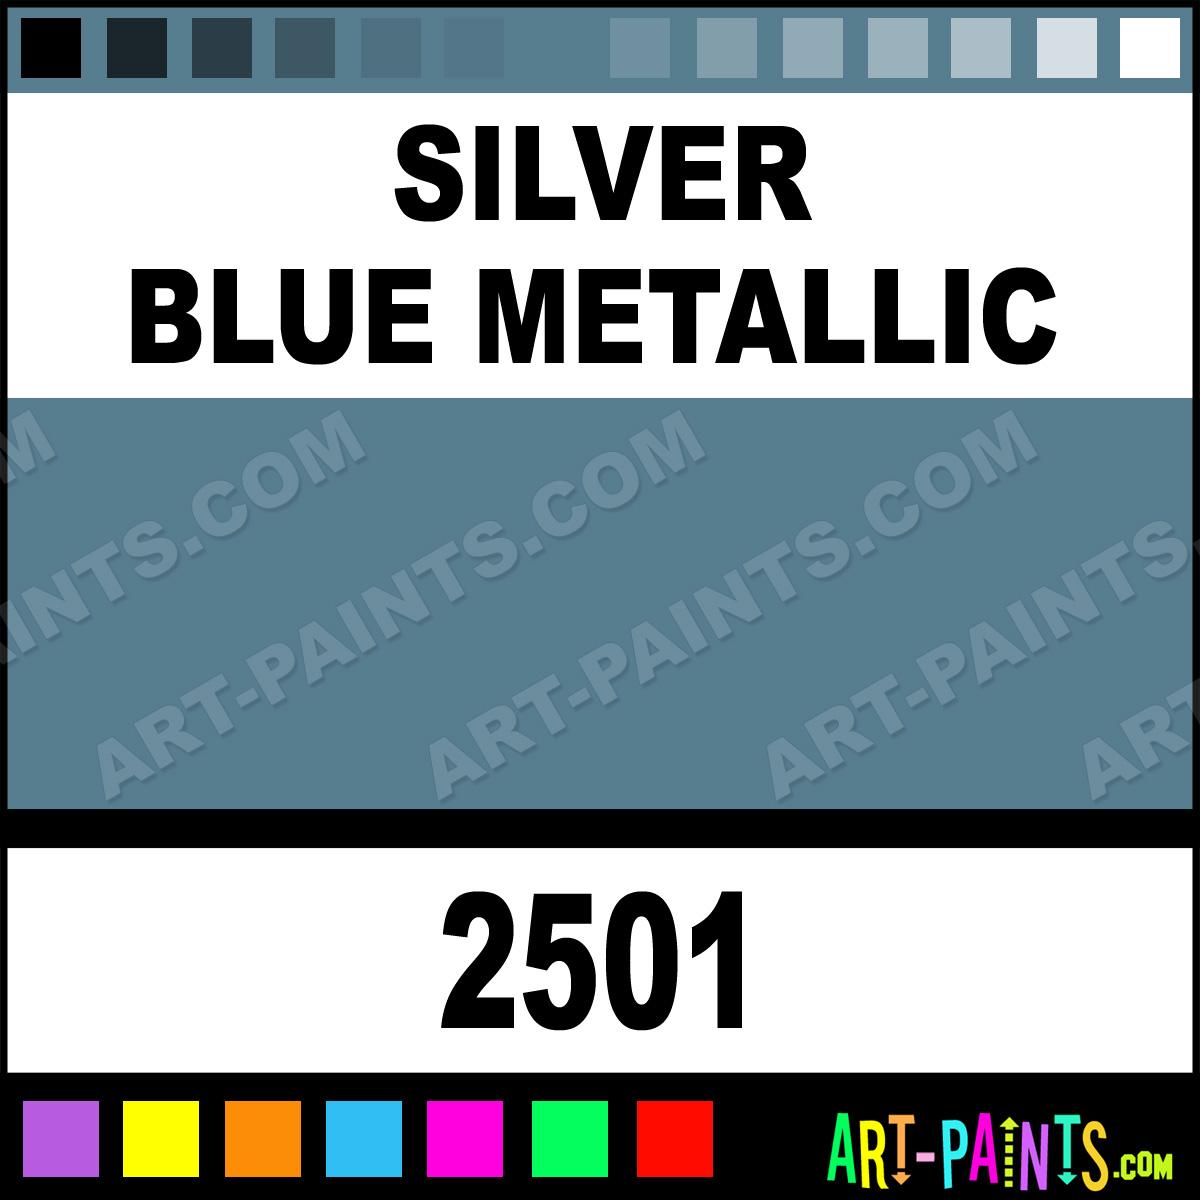 Blue Metallic Silver Paint